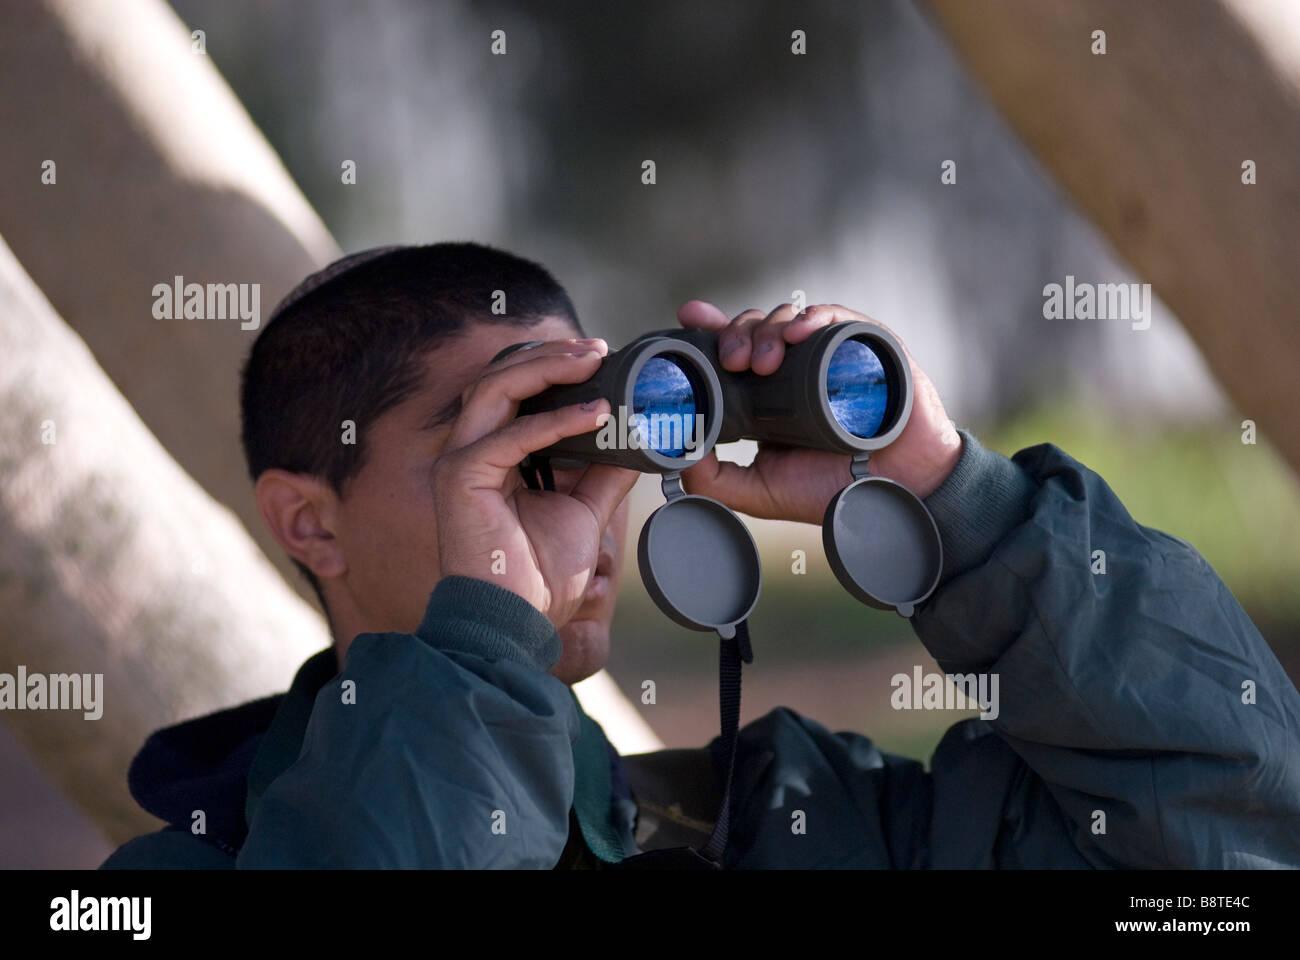 An Israeli soldier using his binoculars near Gaza border southern Israel - Stock Image